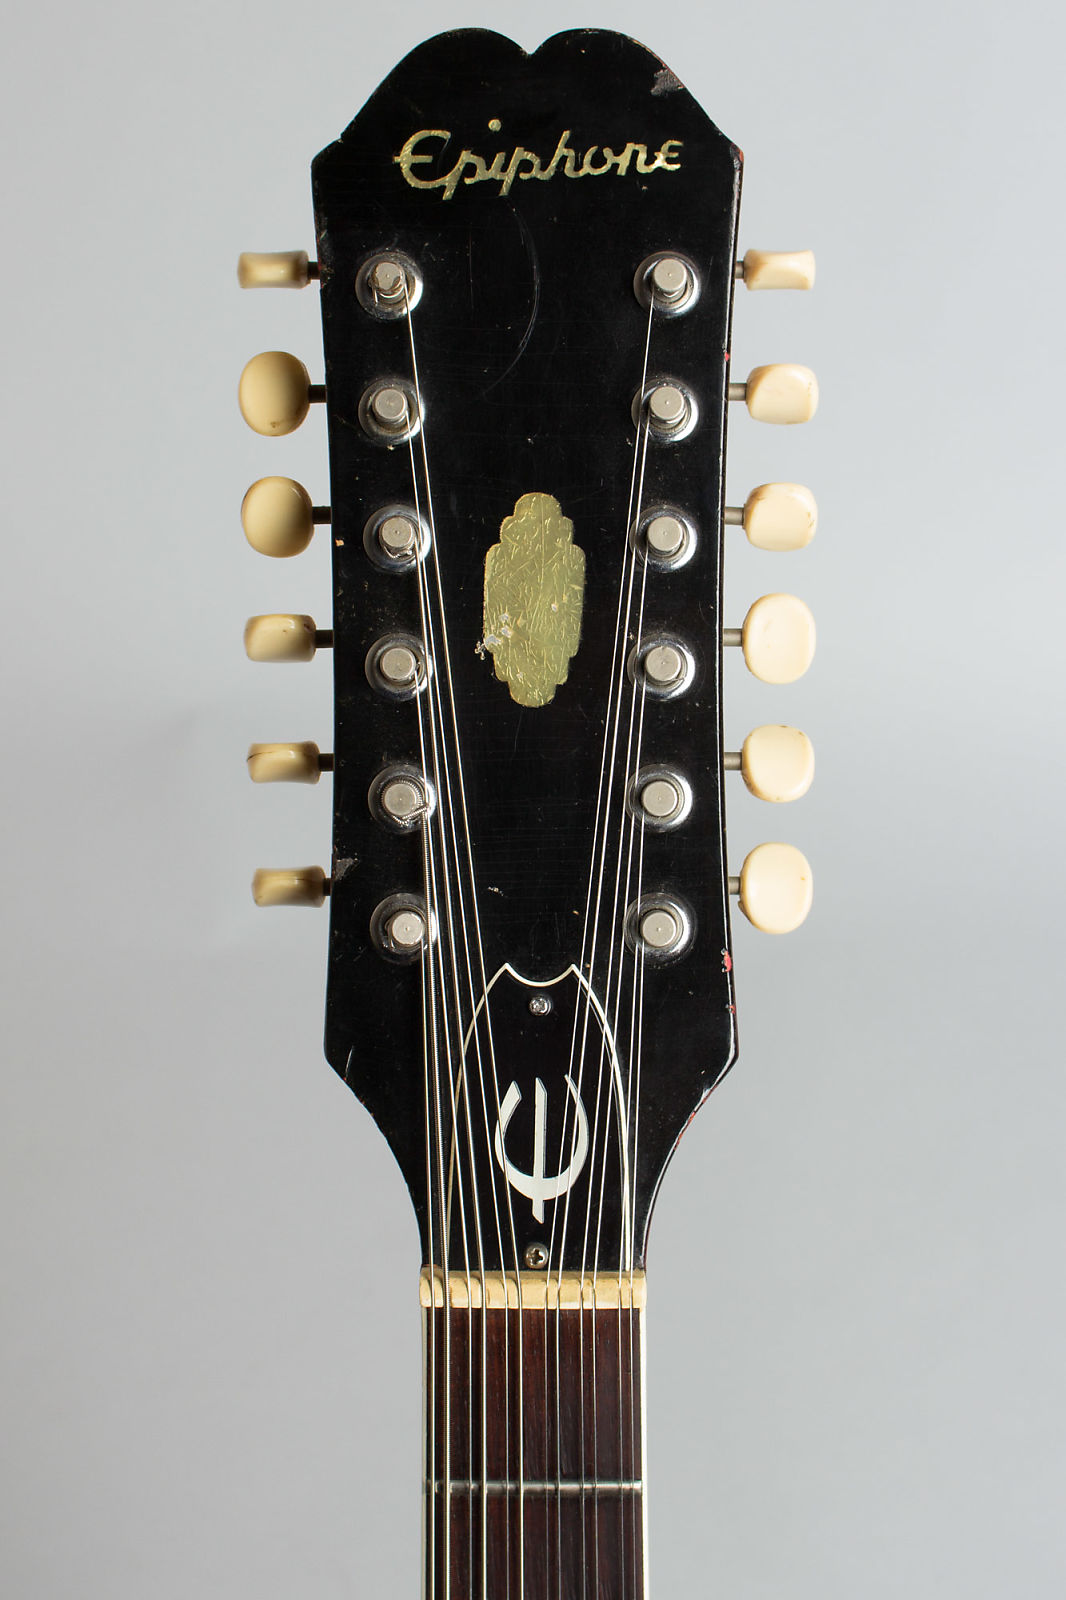 Epiphone  E360TD-C12 Riviera 12 String Semi-Hollow Body Electric Guitar (1967), ser. #878538, black hard shell case.